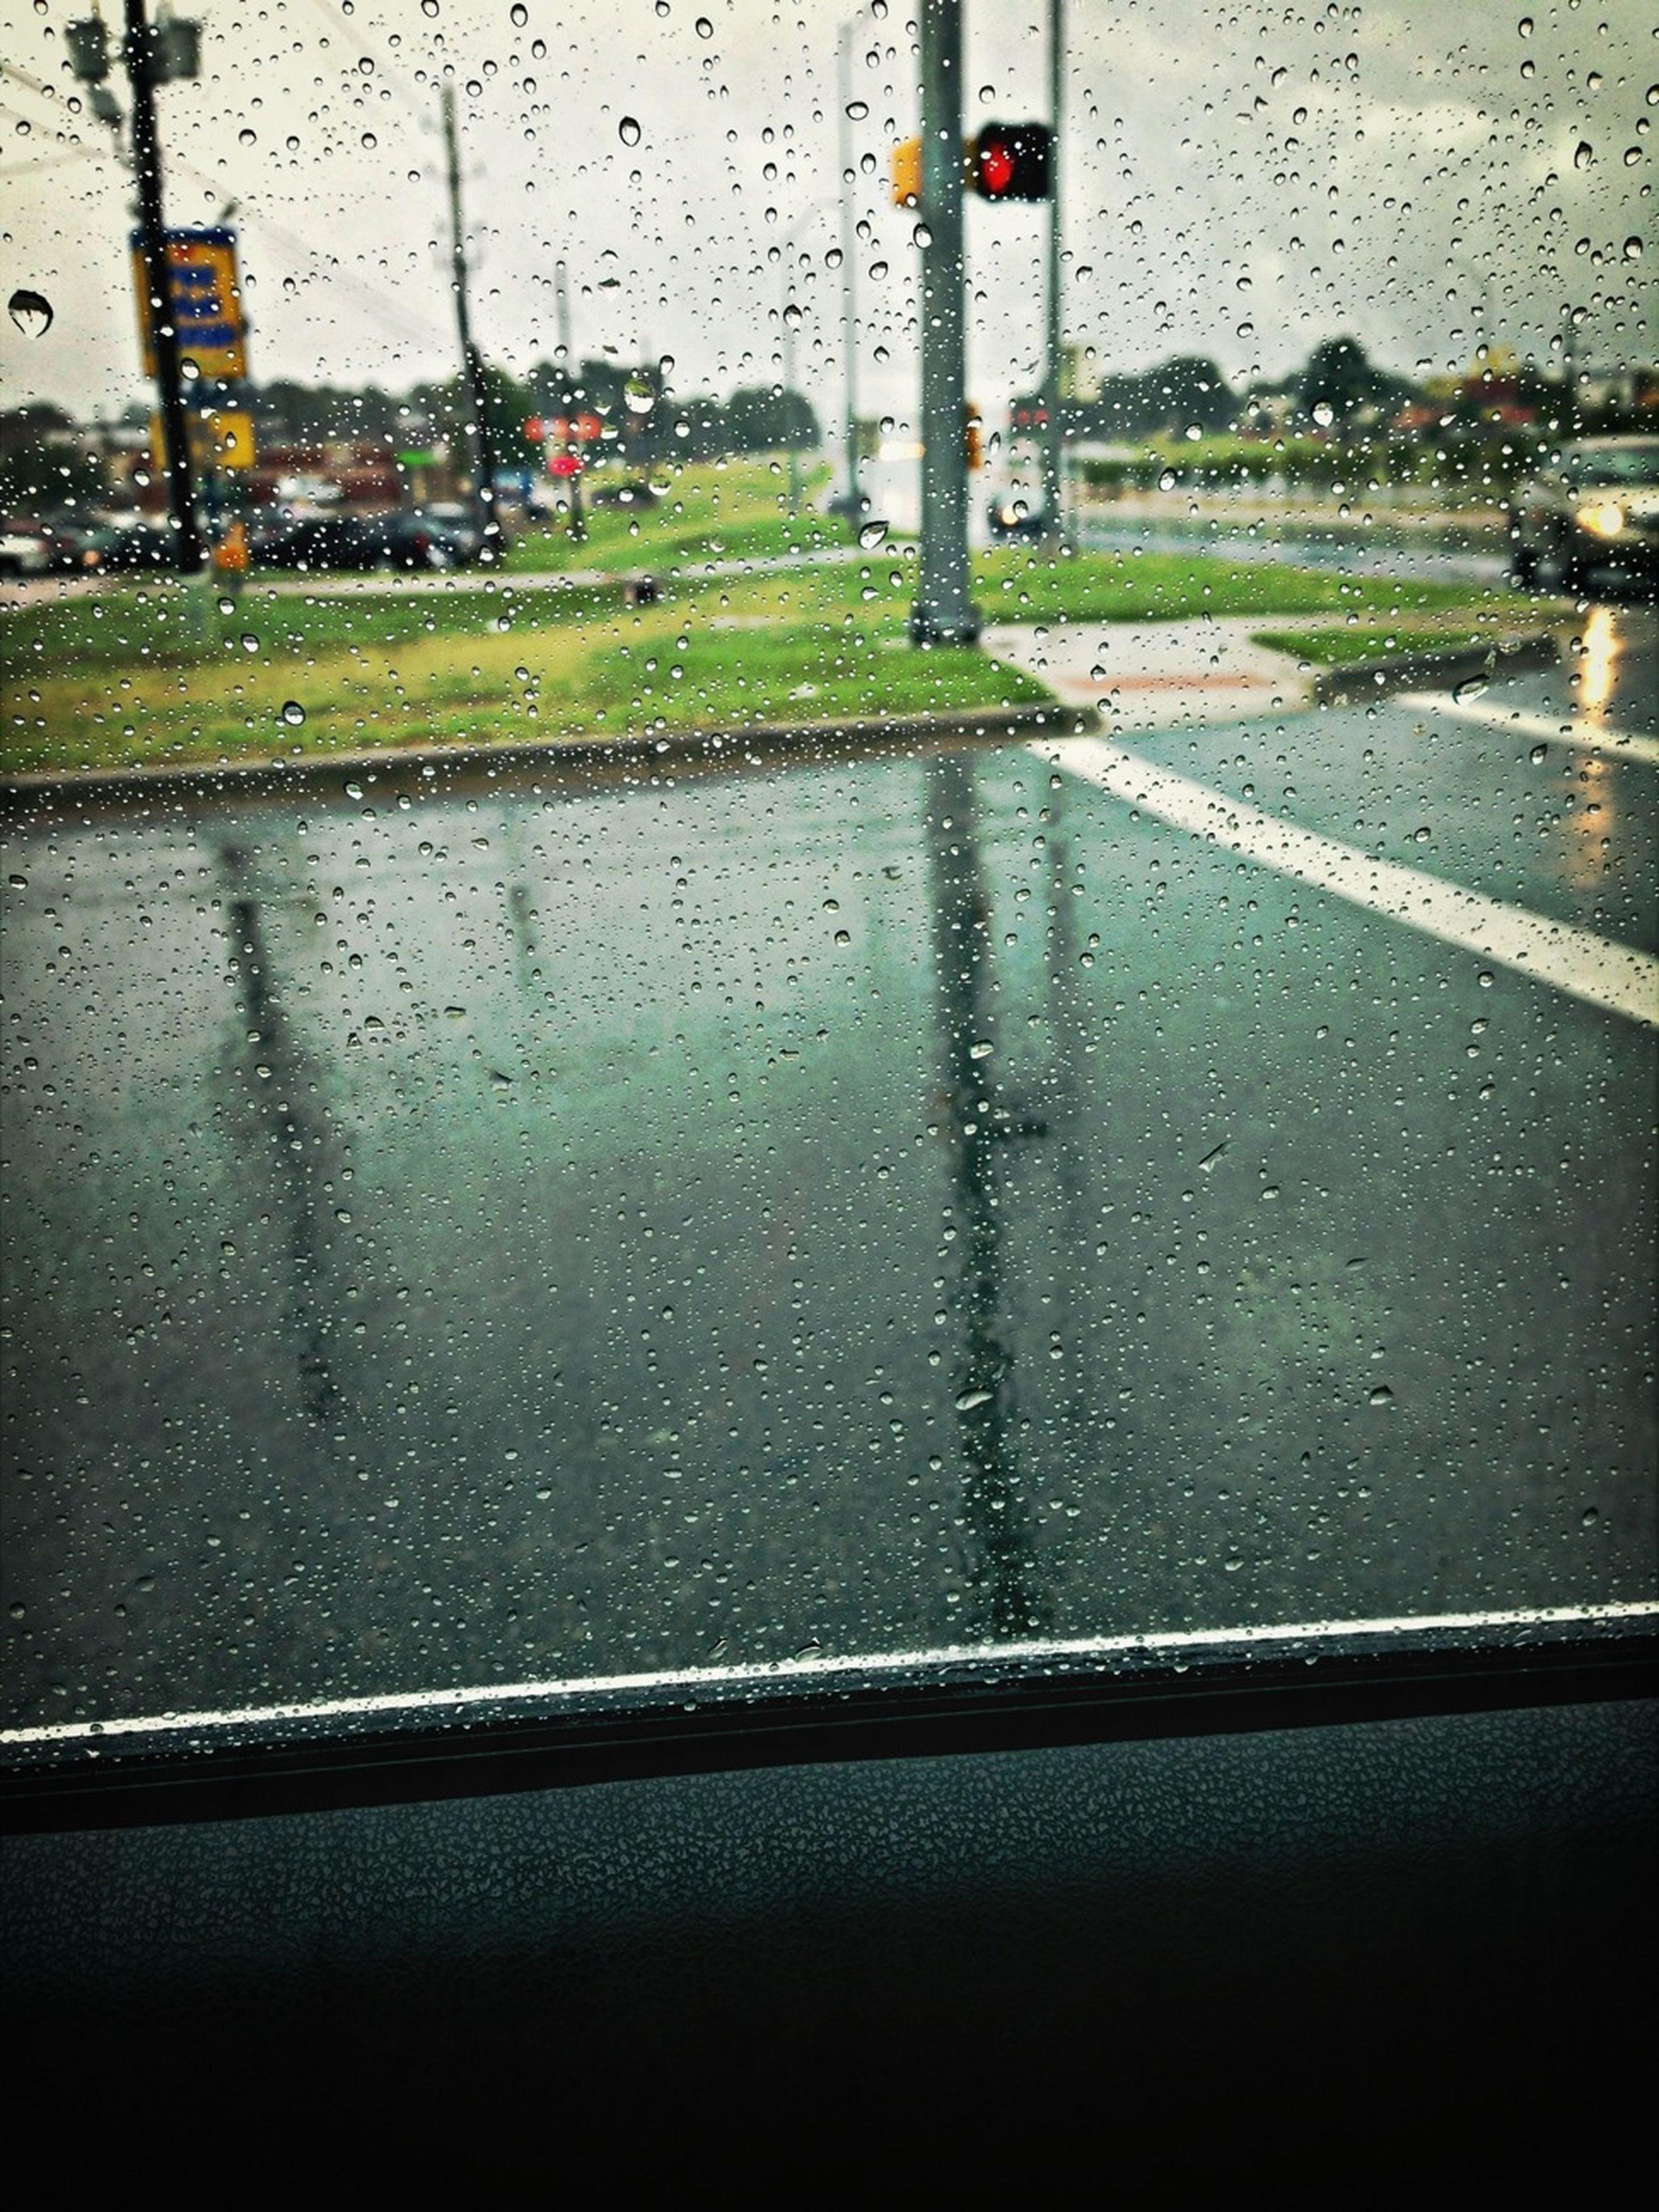 transportation, wet, window, rain, drop, transparent, glass - material, mode of transport, car, water, land vehicle, vehicle interior, raindrop, season, weather, road, street, indoors, windshield, glass